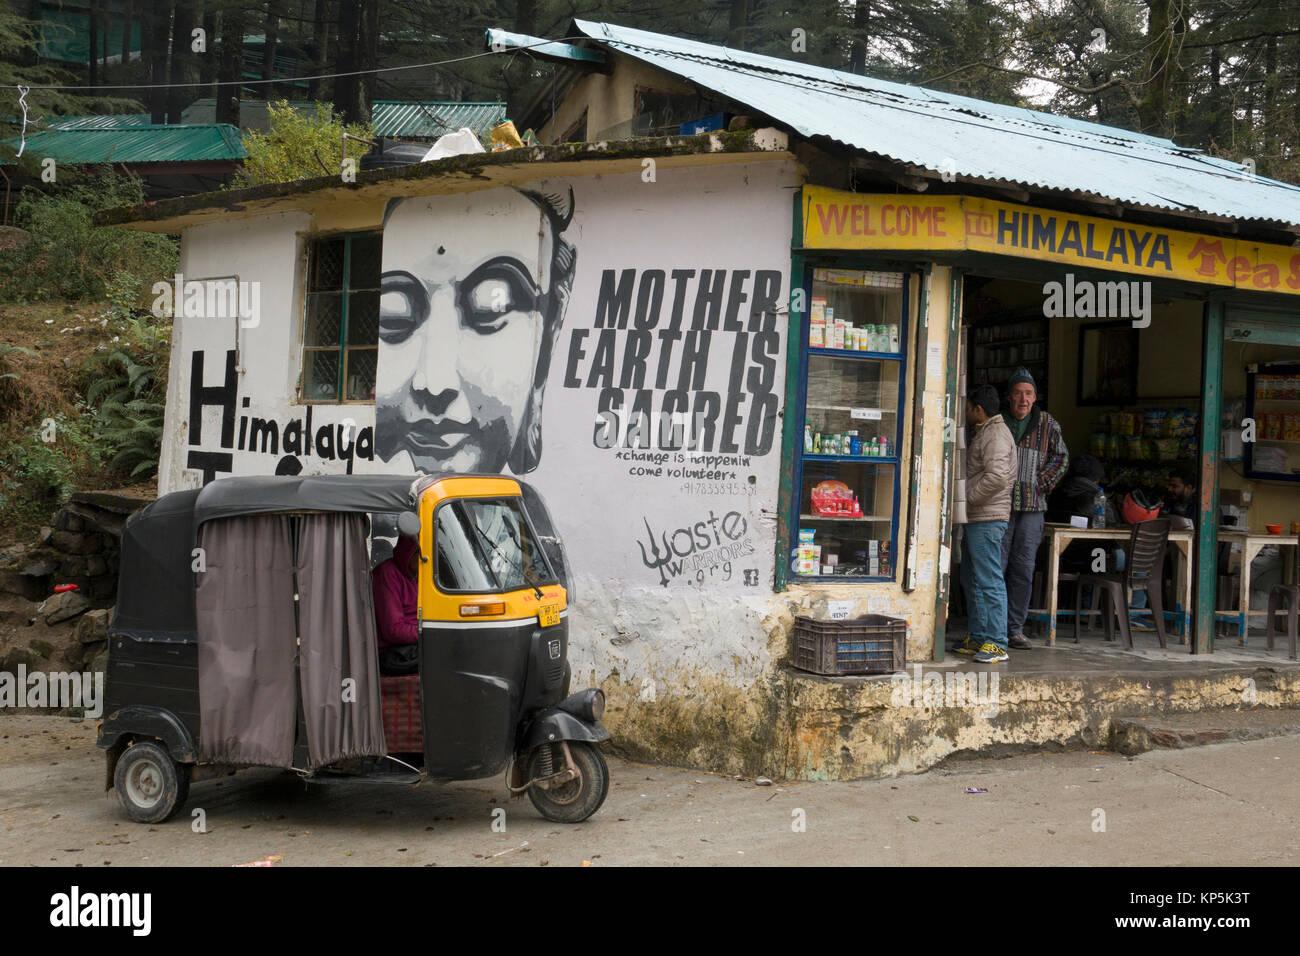 Auto rickshaw parked outside Himalaya tea shop in Dharamkot, India - Stock Image